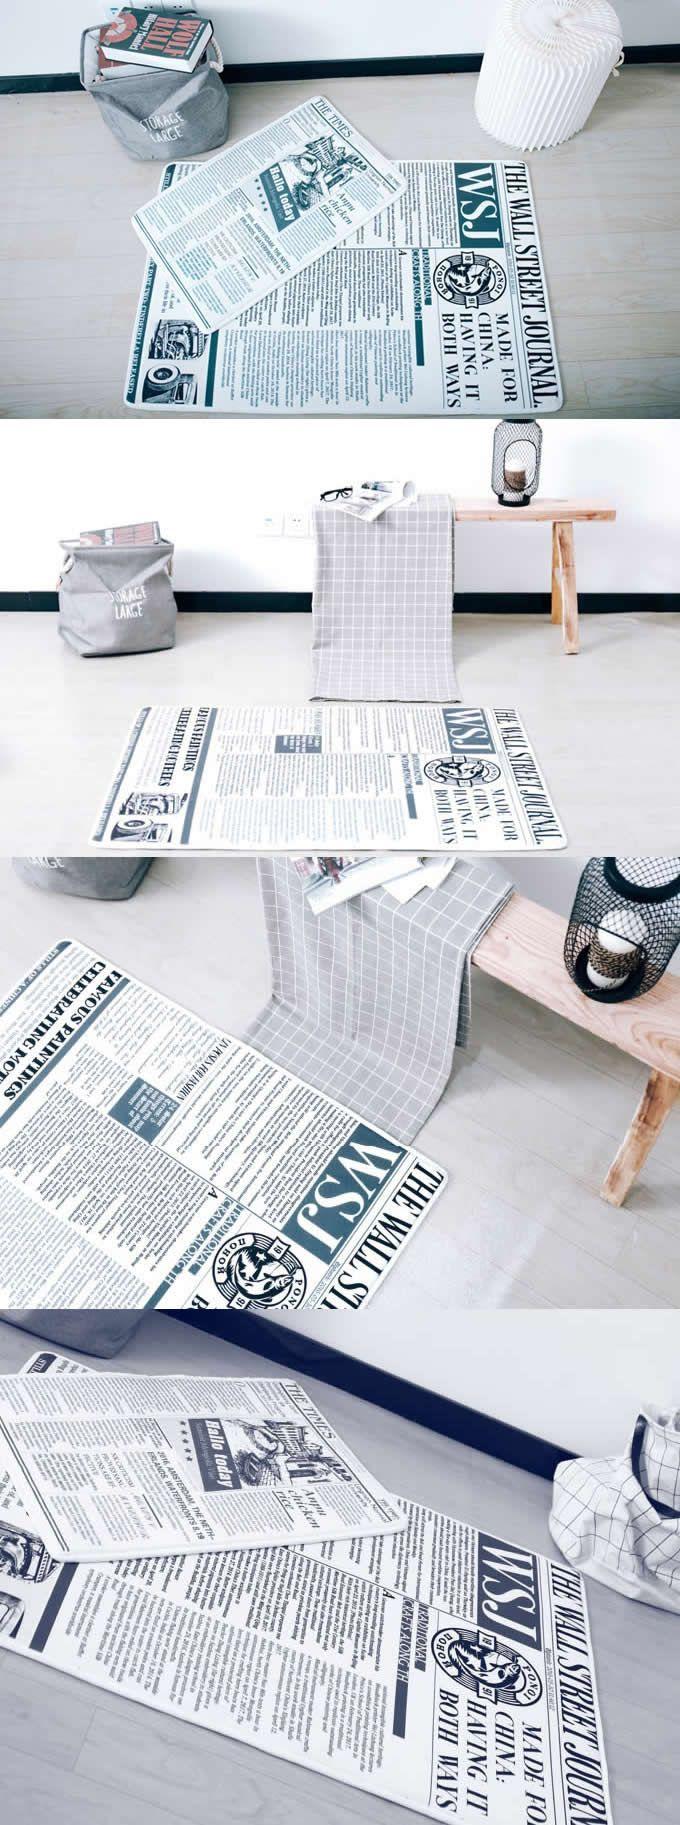 Newspaper Style Carpet Mat Rug Modern Living Bedroom Newspaper Style Area Rugs Anti-Slip Floor Rug Mat Washable Soft Bathroom Carpet Mat Home Textile